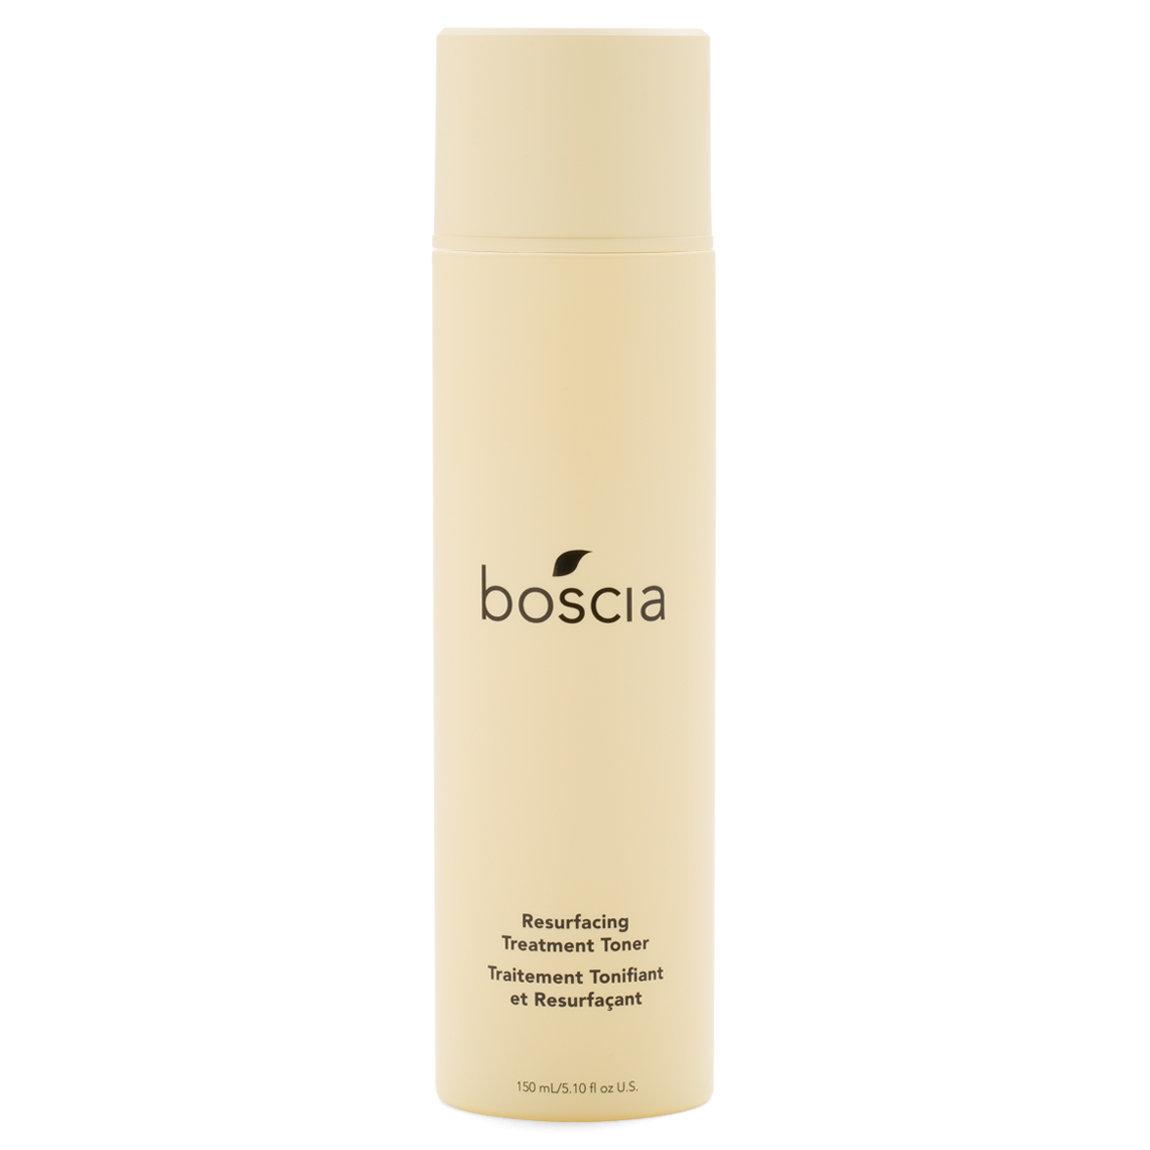 boscia Resurfacing Treatment Toner with Apple Cider Vinegar product swatch.